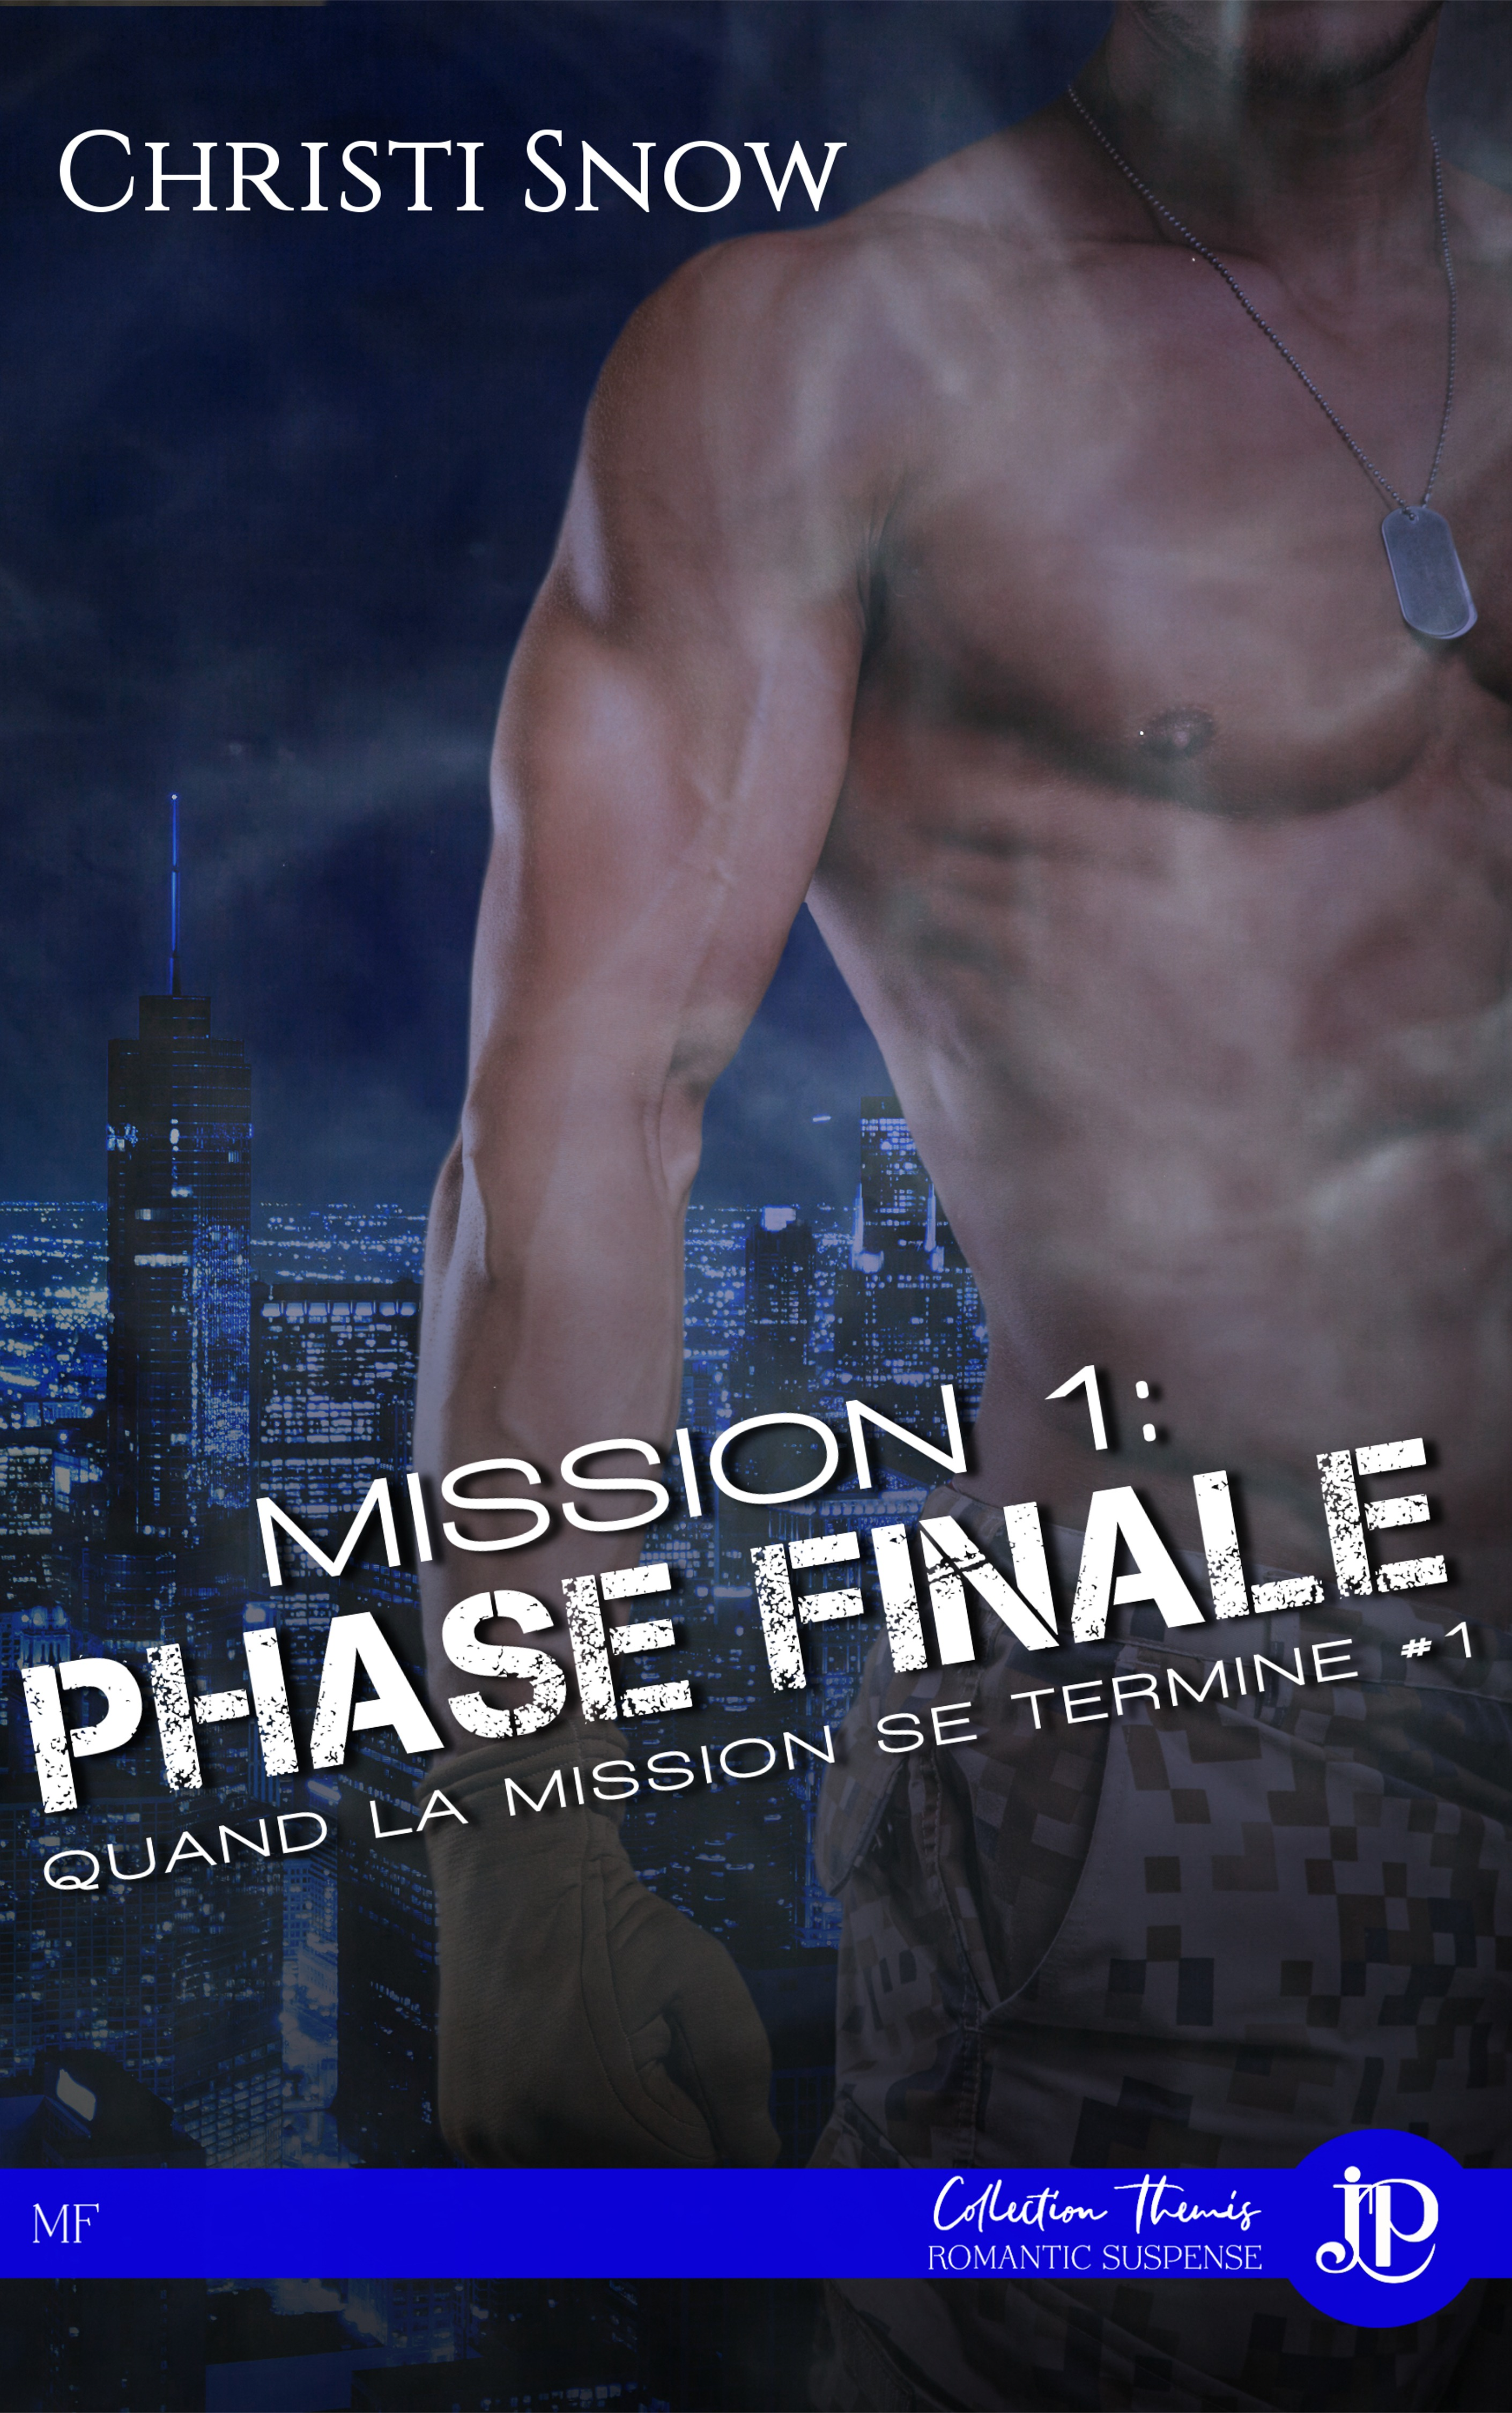 Mission 1 : Phase Finale, QUAND LA MISSION SE TERMINE #1